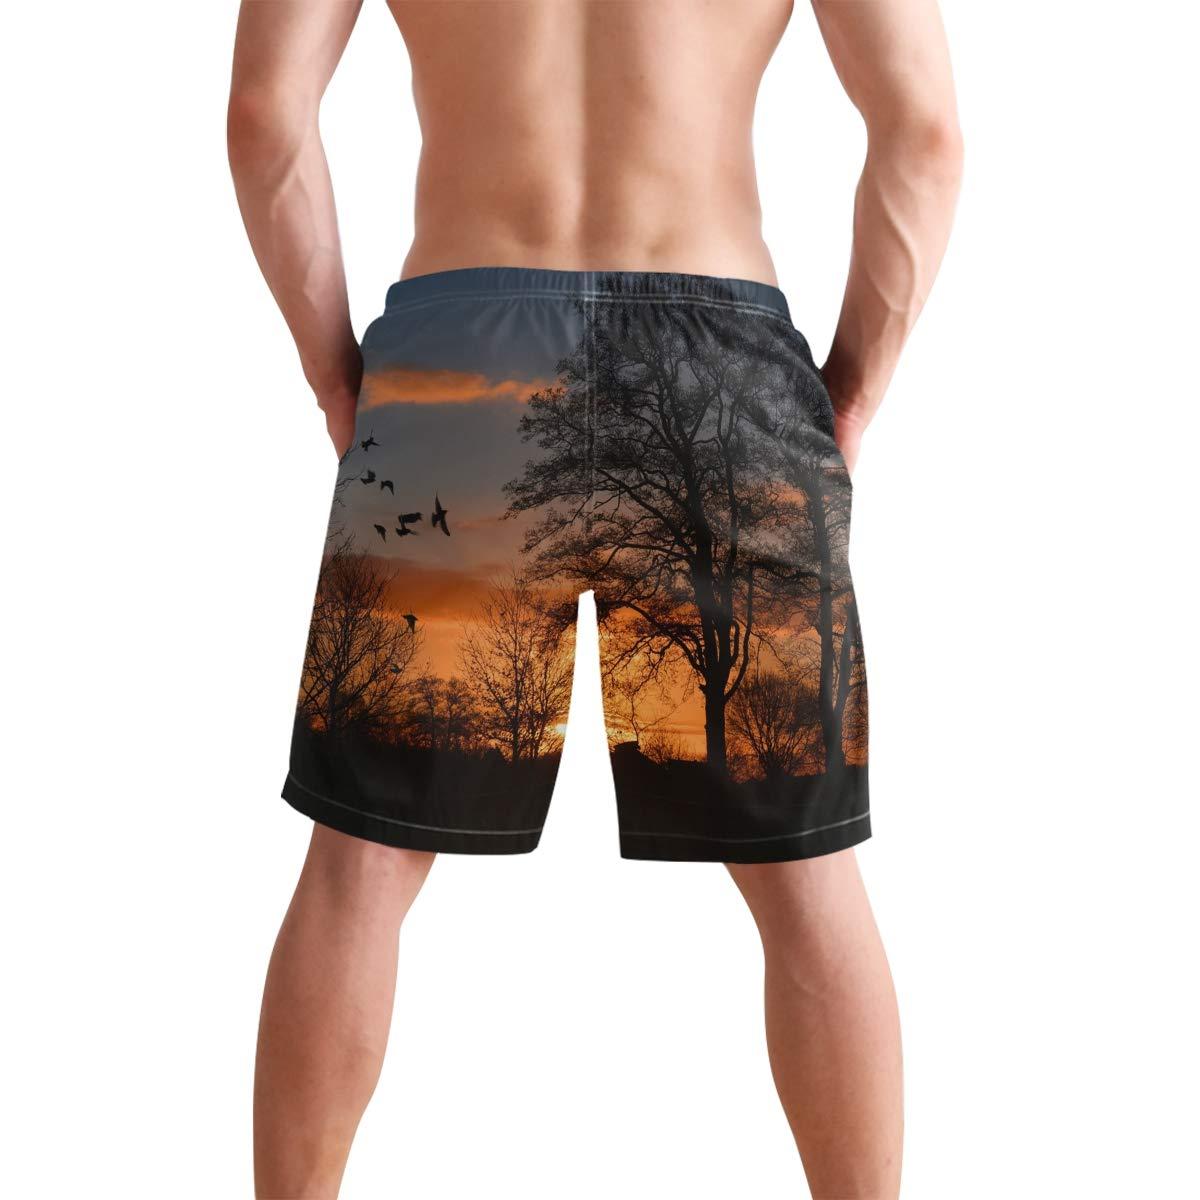 Mens Beach Swim Trunks Sunrise Bird Tree Boxer Swimsuit Underwear Board Shorts with Pocket